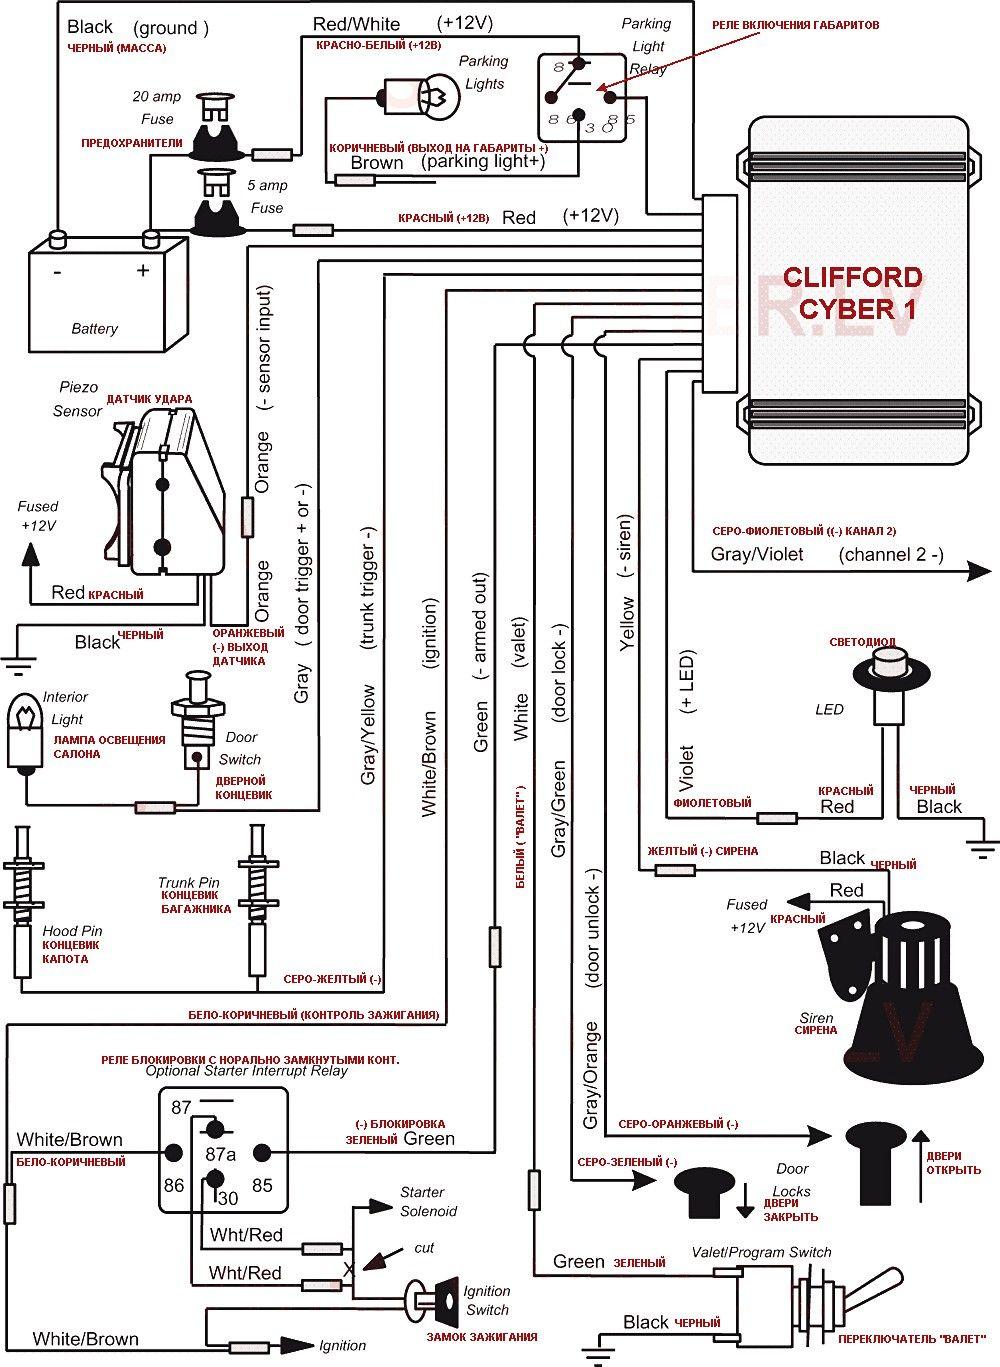 55 Elegant Viper Remote Starter Wiring Diagram Installation Manual Diagram Viper